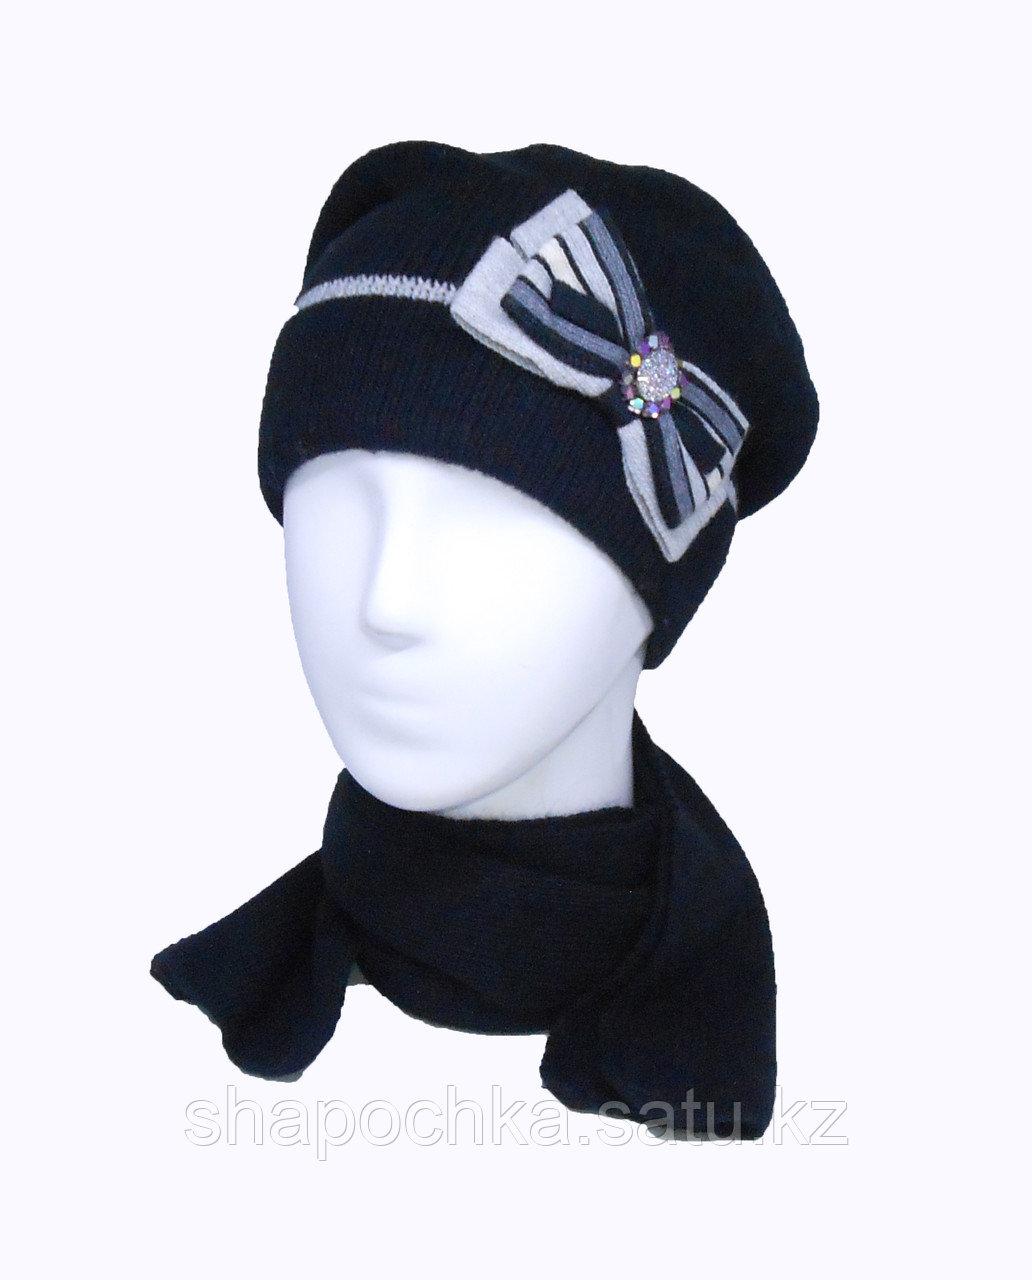 Шапка+шарф Landre Маргарита конверт бант